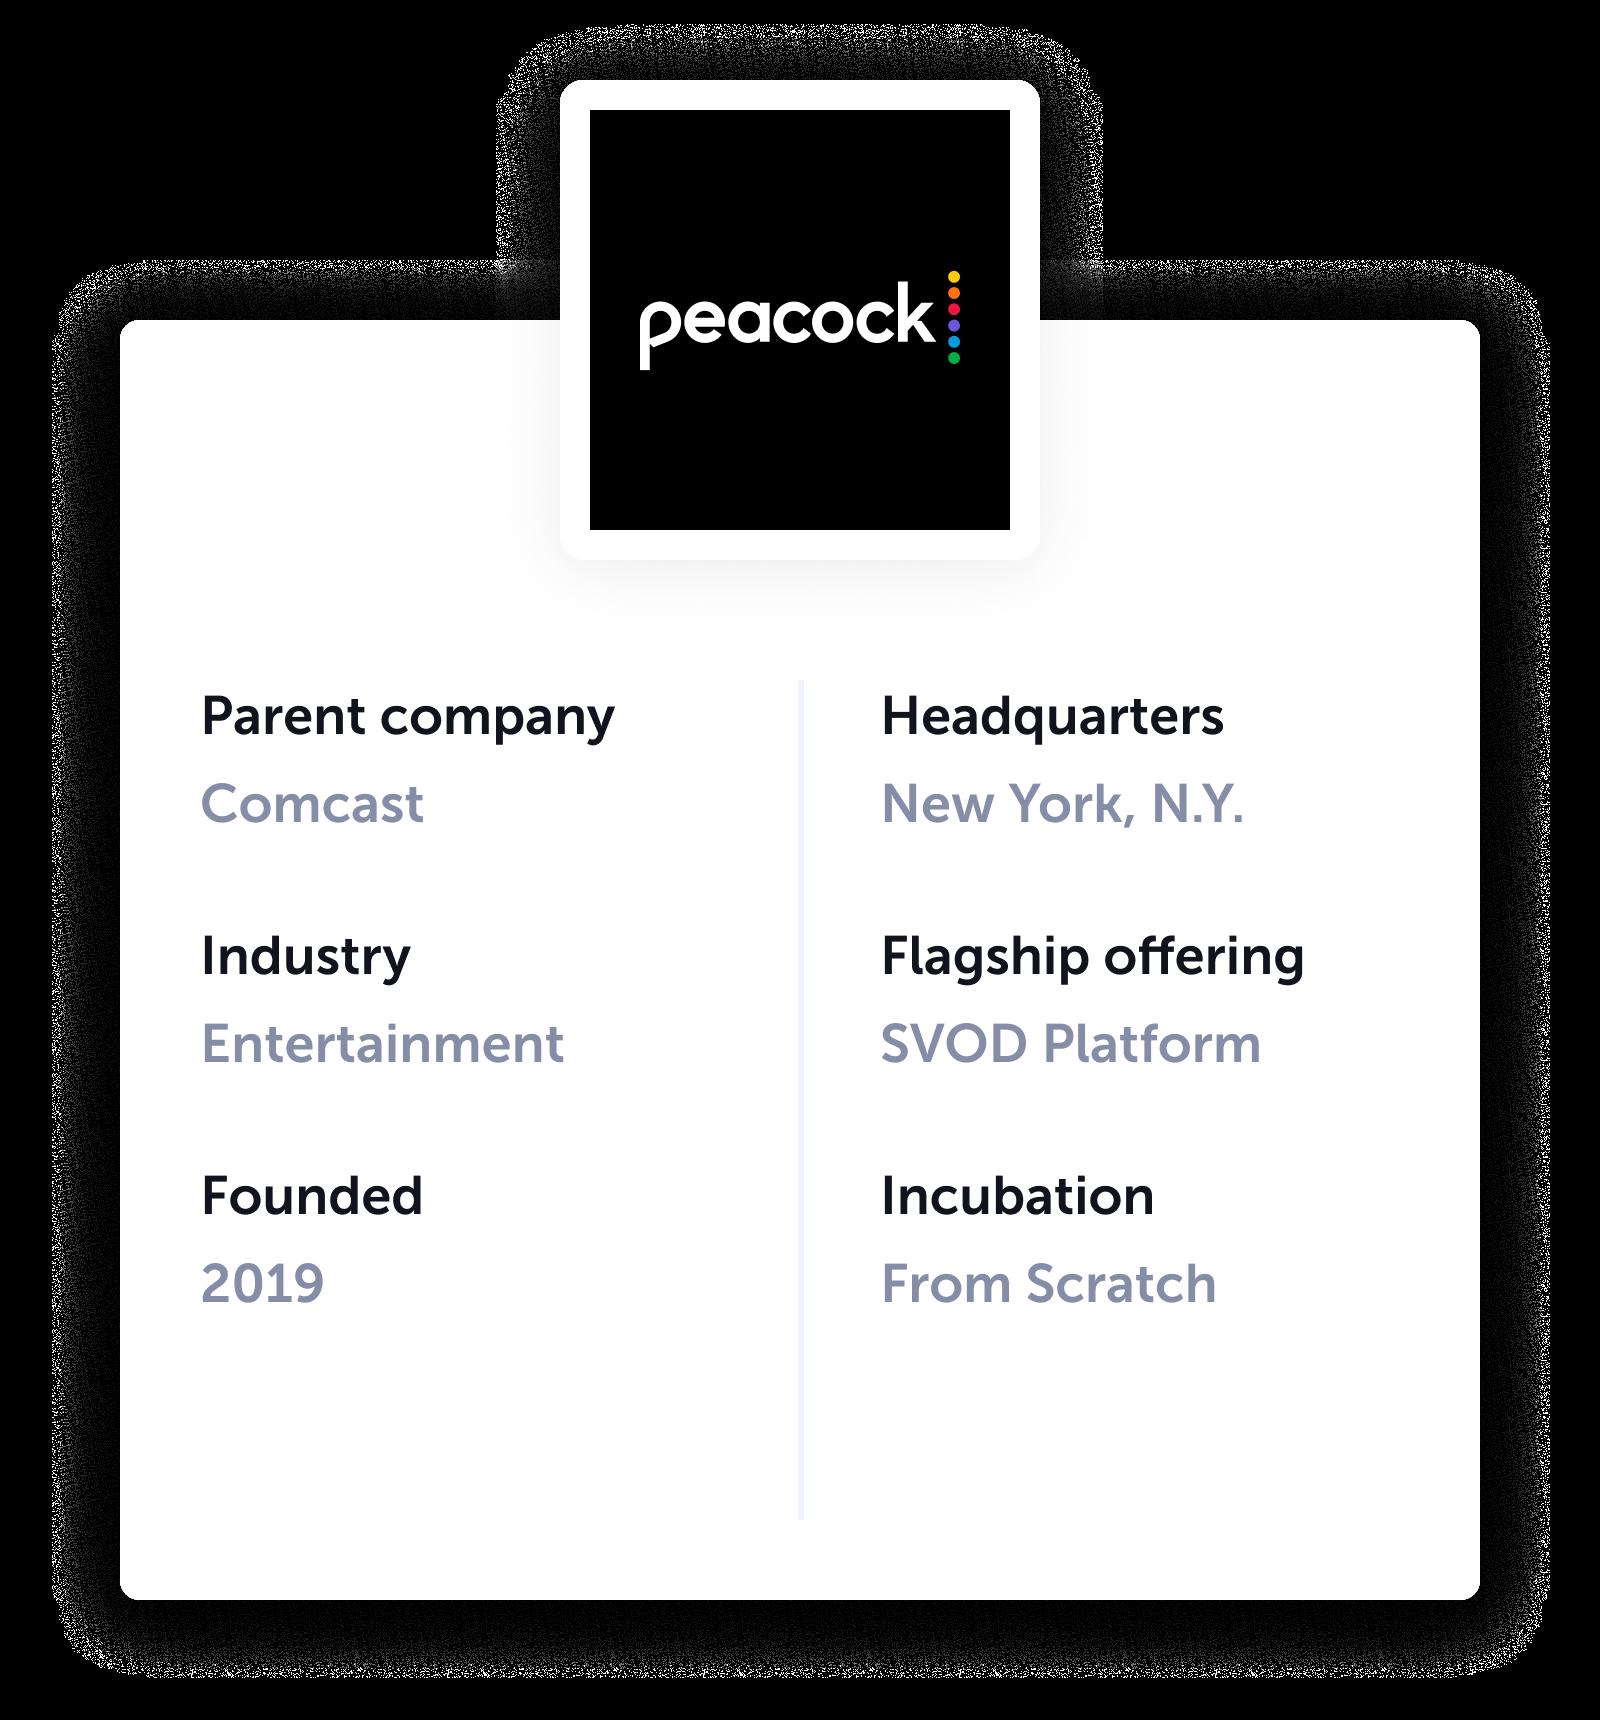 peacock company profile